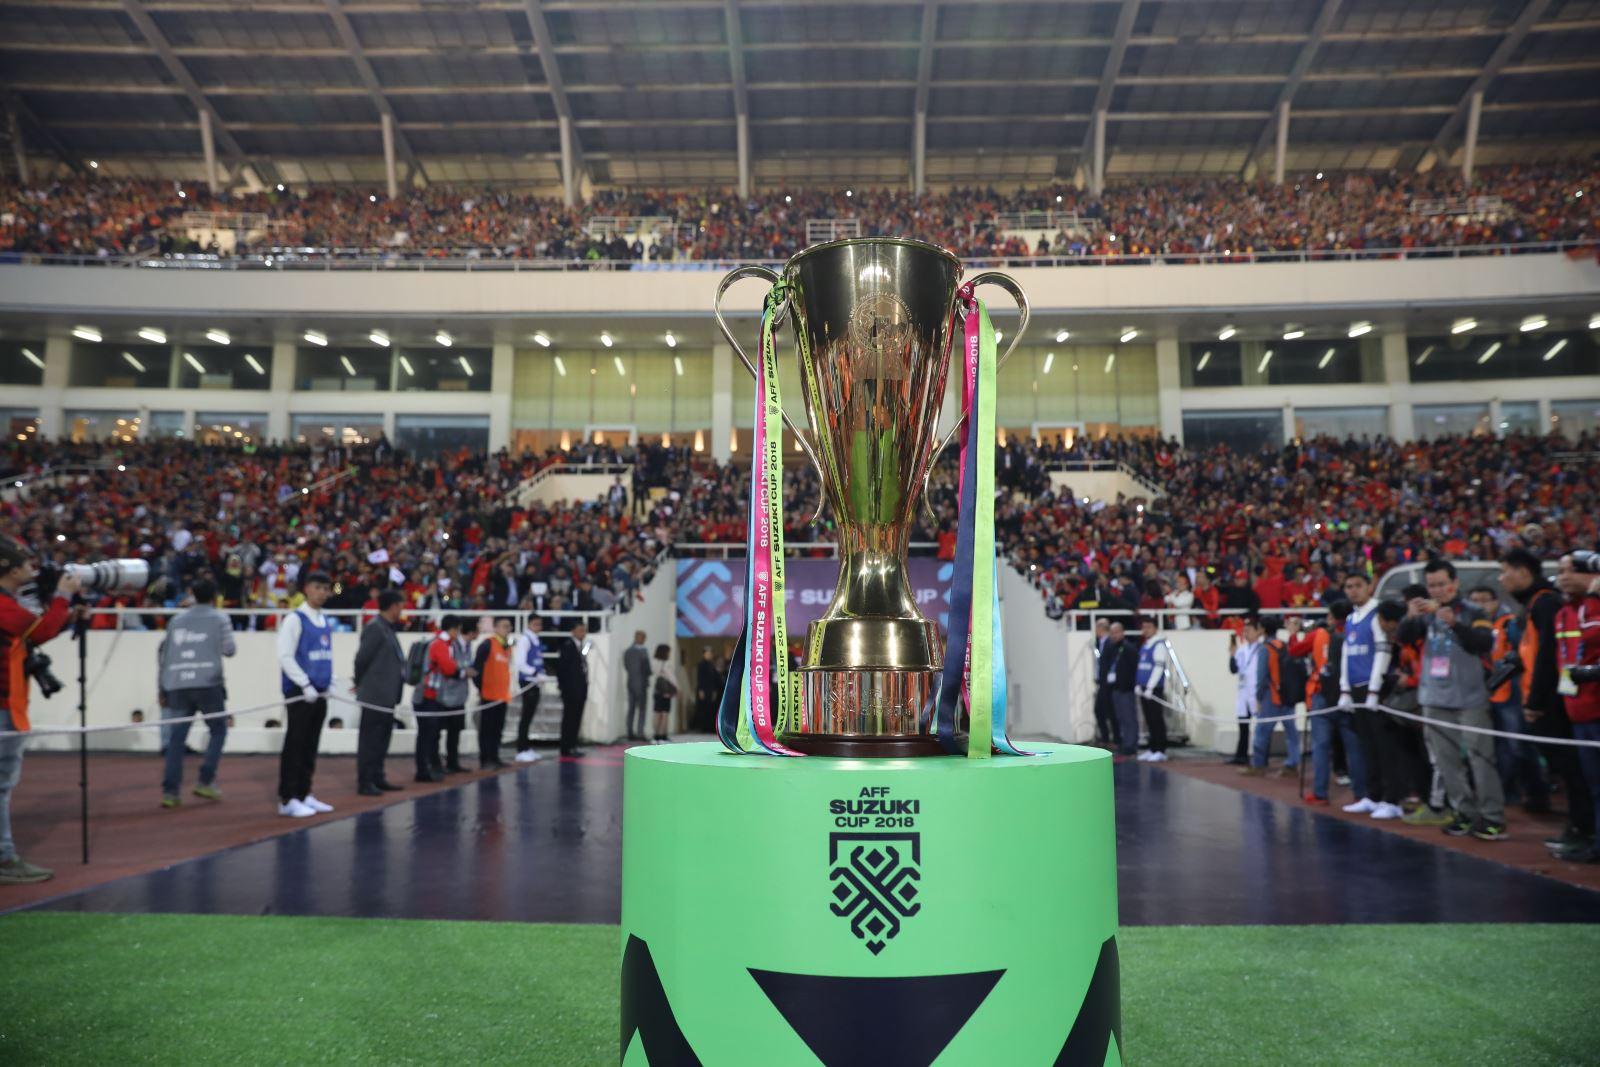 VTV5, VTV6, AFF Cup, hoãn lễ bốc thăm AFF Cup, dtvn, park hang seo, vòng loại World Cup, lịch thi đấu vòng loại World Cup, V-League, lịch thi đấu AFF Cup